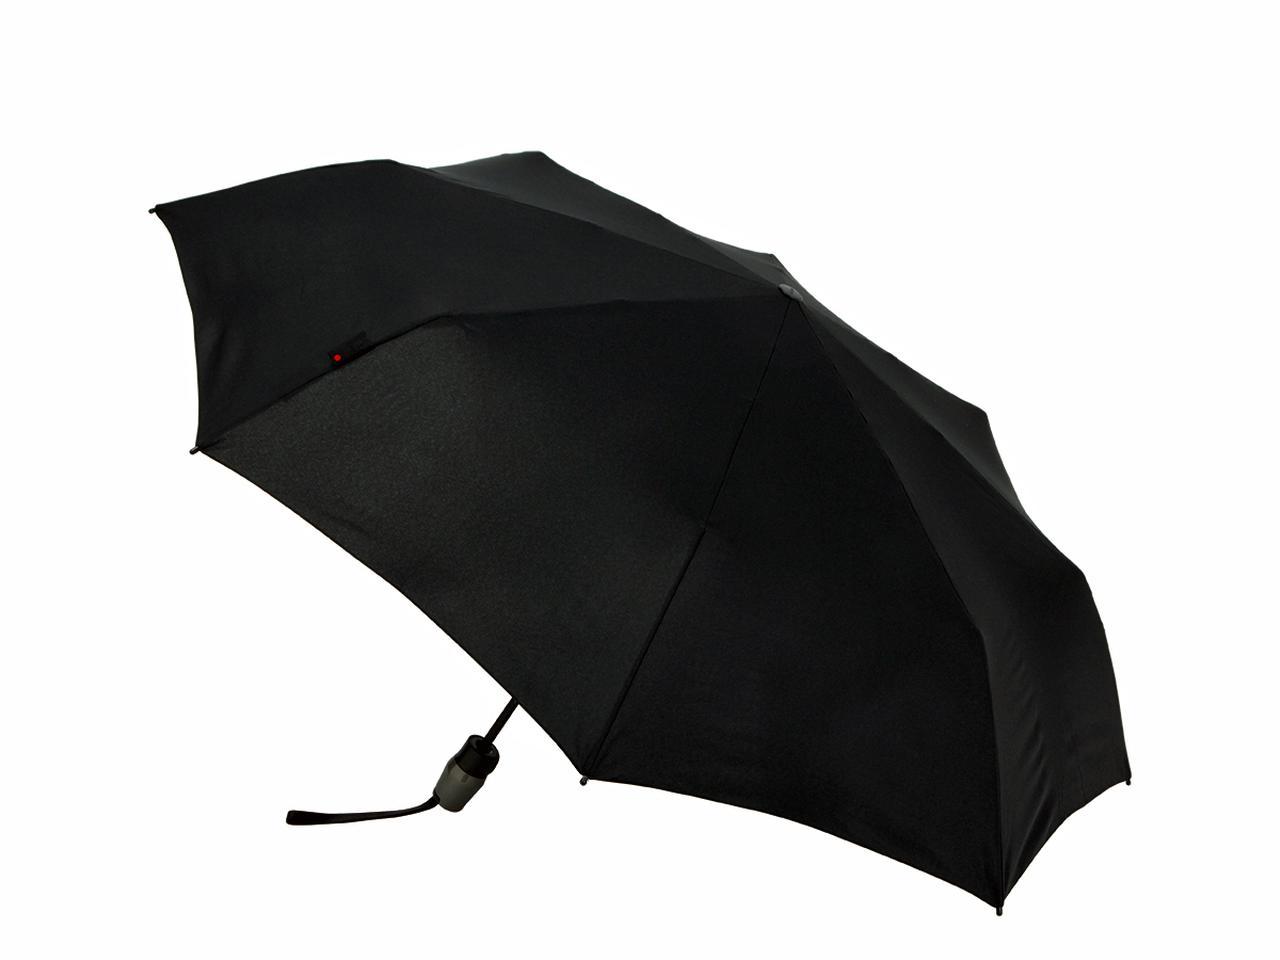 Images : 1番目の画像 - 「クニルプス」自動開閉式折りたたみ傘 - Webモーターマガジン